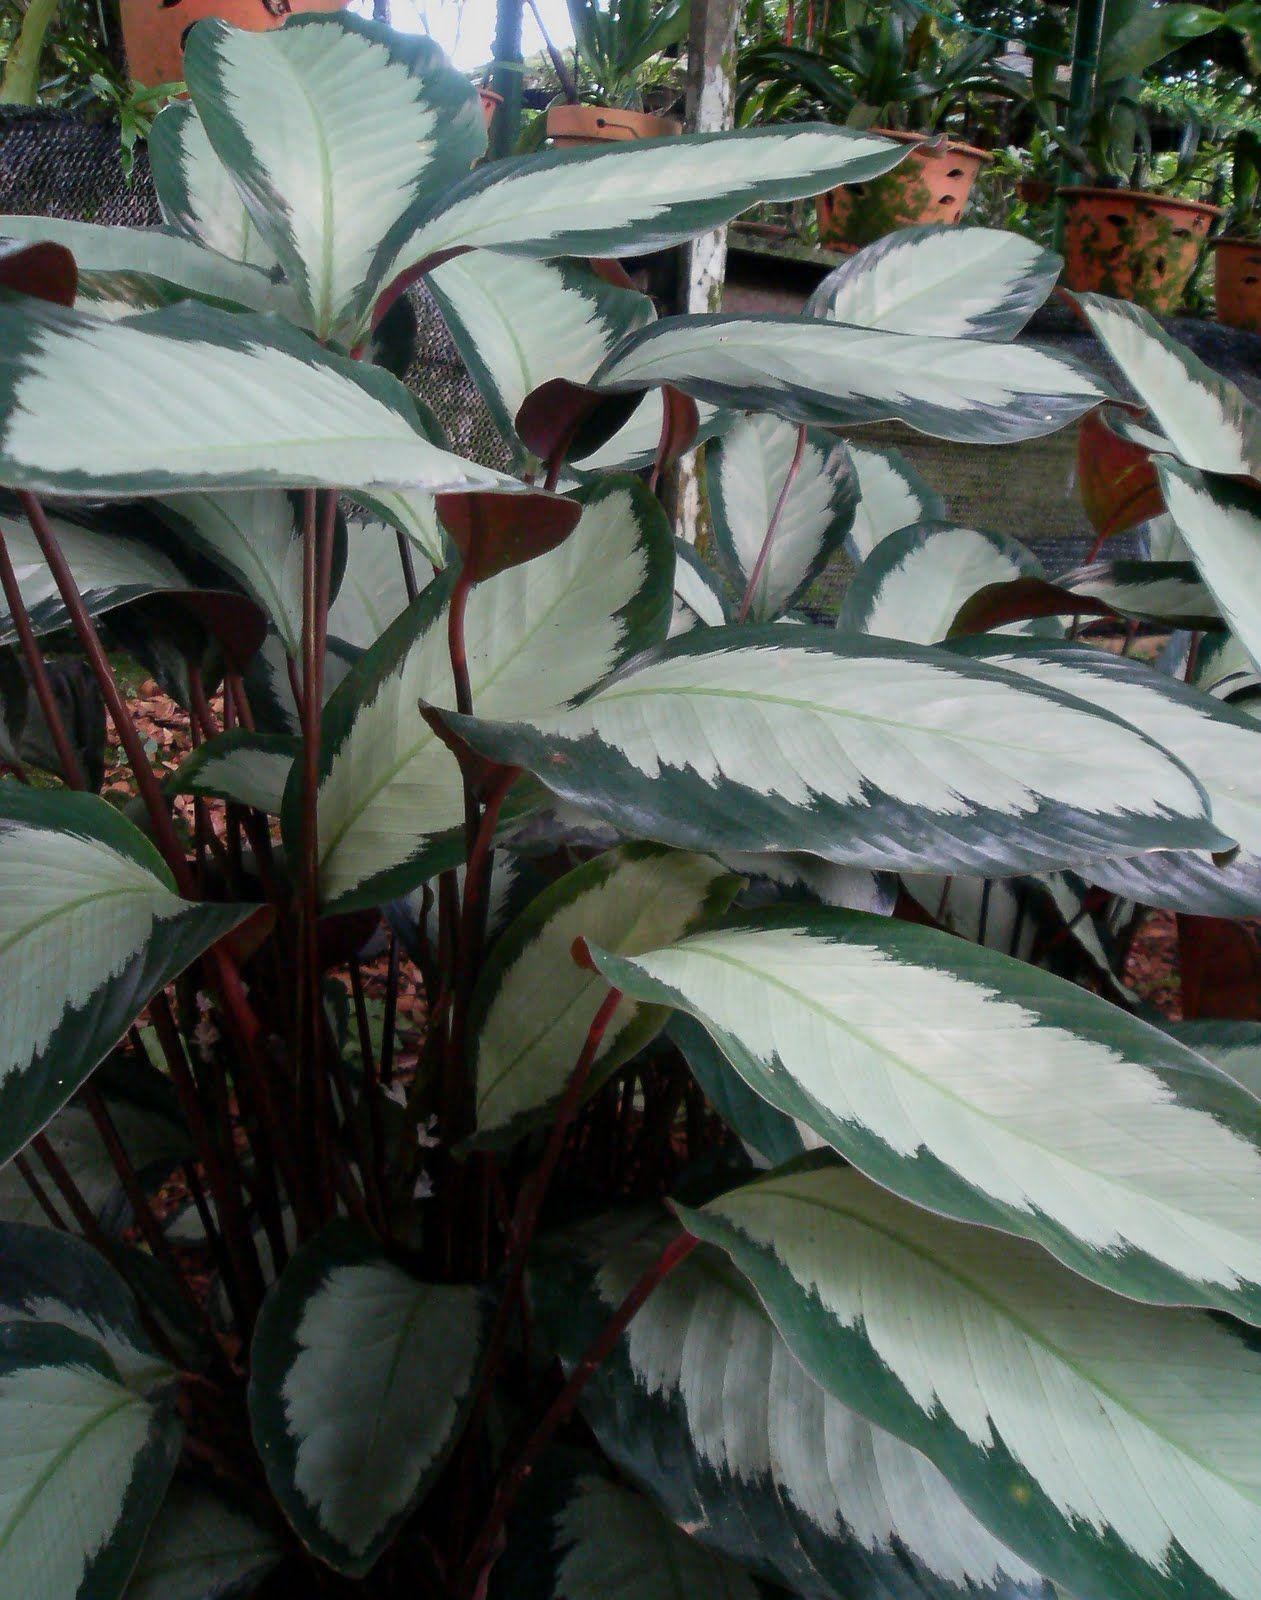 Calathea picturata 39 argentea 39 jardines plantas for Vivero plantas exoticas